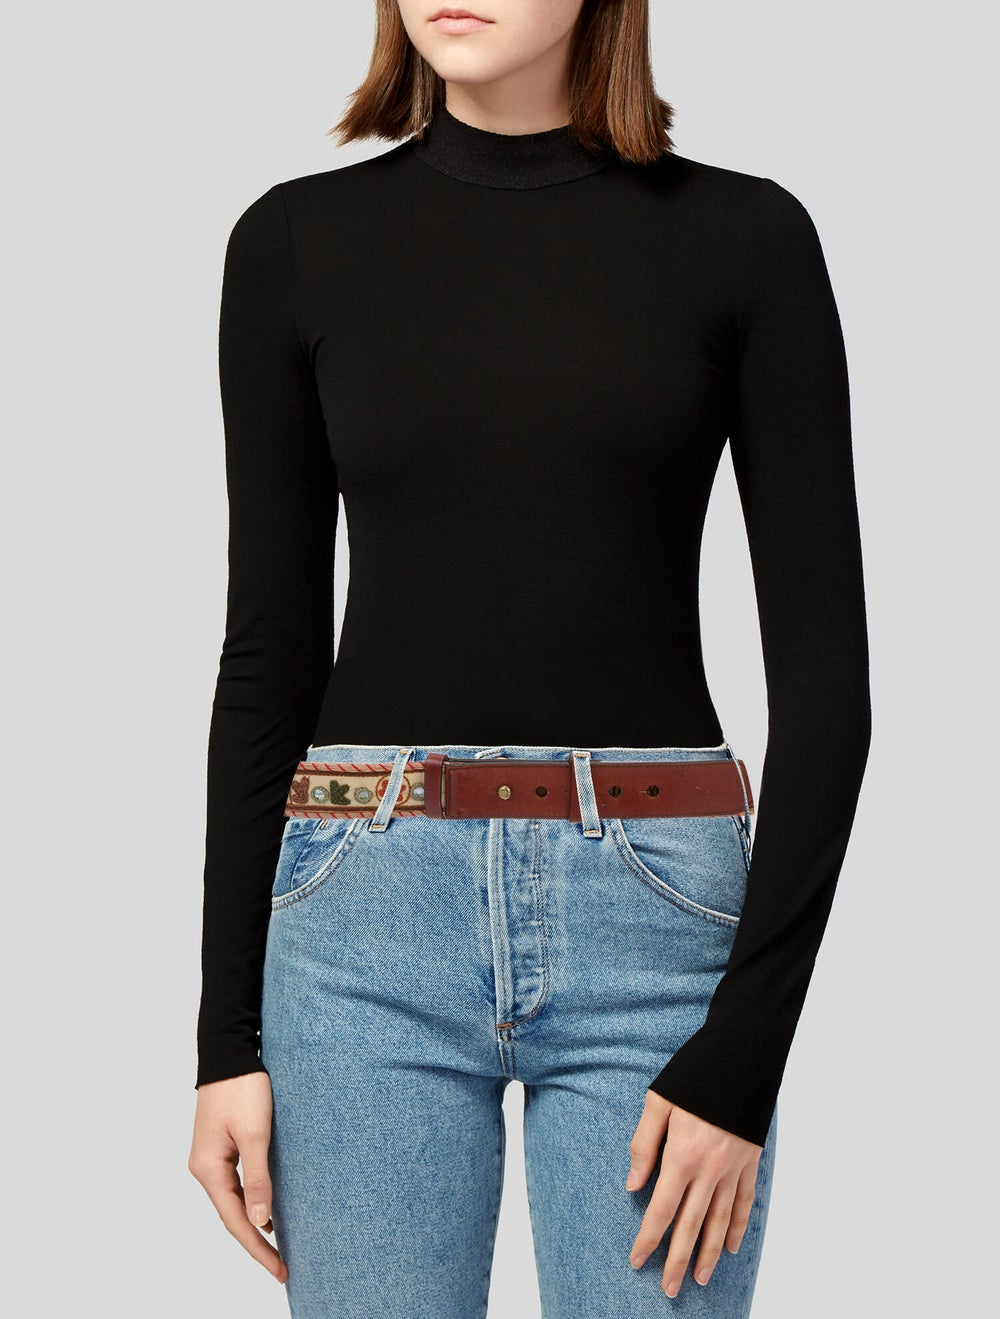 Alexander McQueen Embroidered Hip Belt Tan - image 2